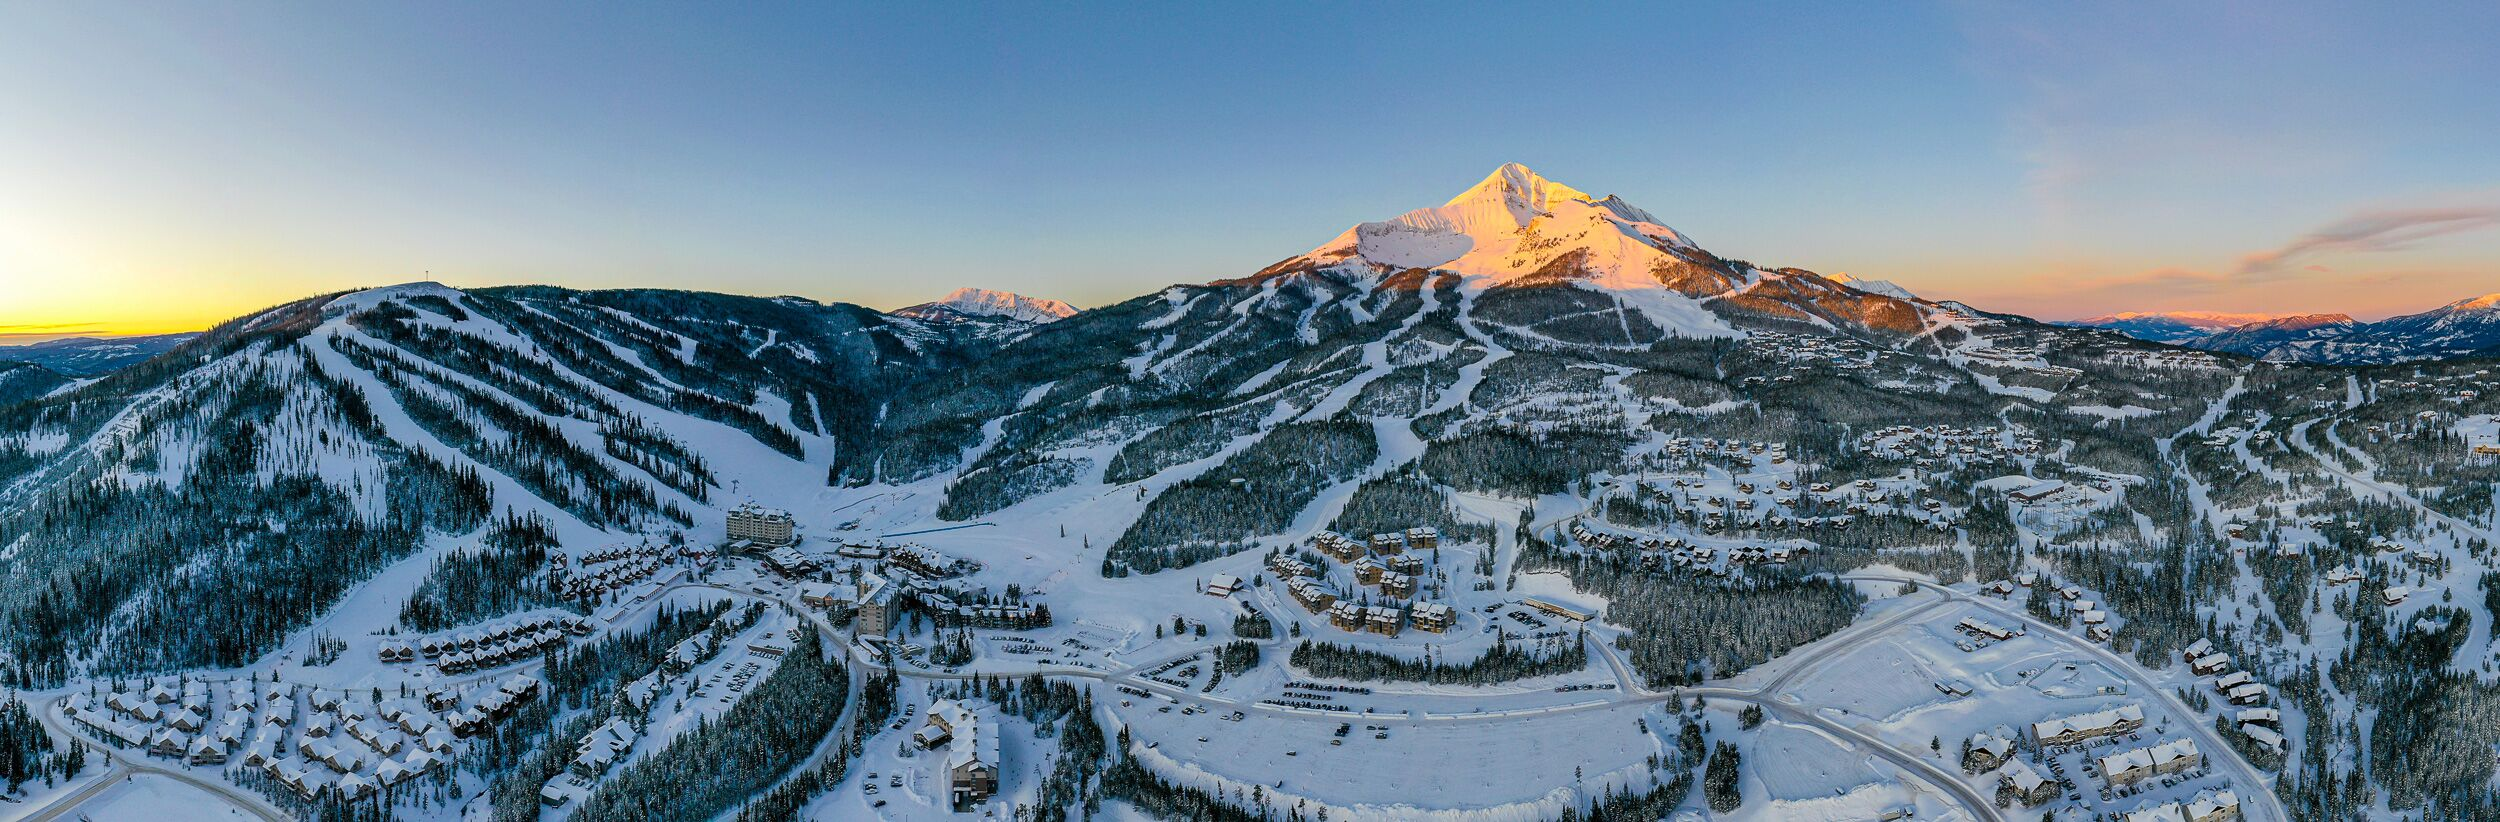 Ski.com Dream Job, Ski Dream Job, ski dream trip